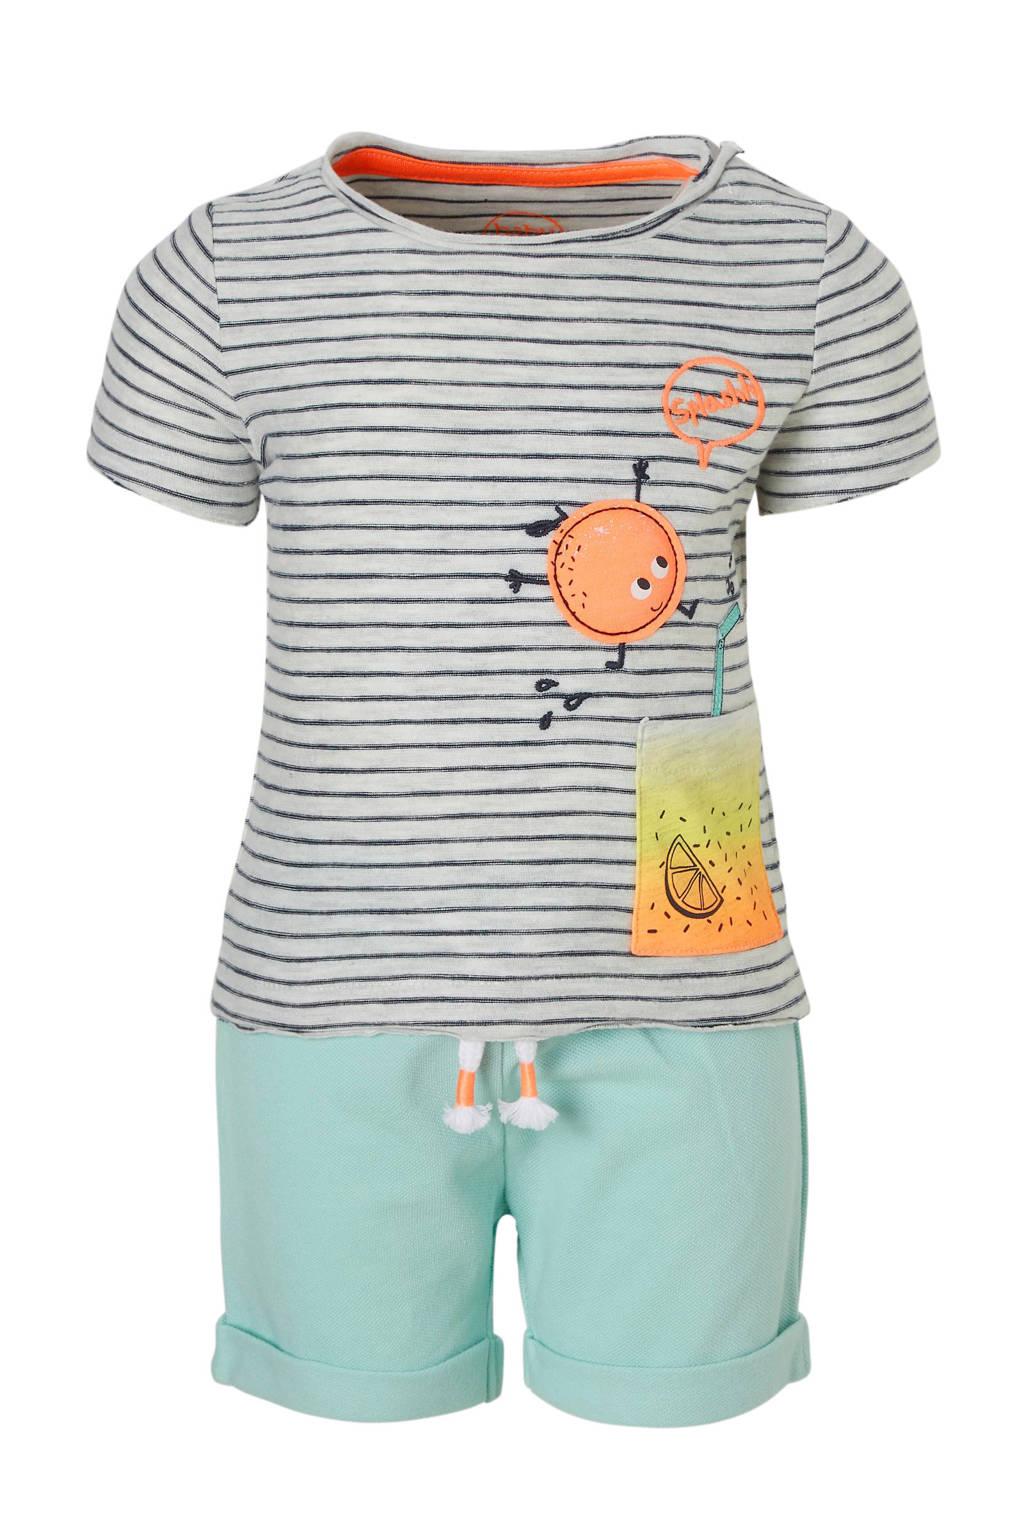 C&A Baby Club T-shirt+short, Lichtgrijs